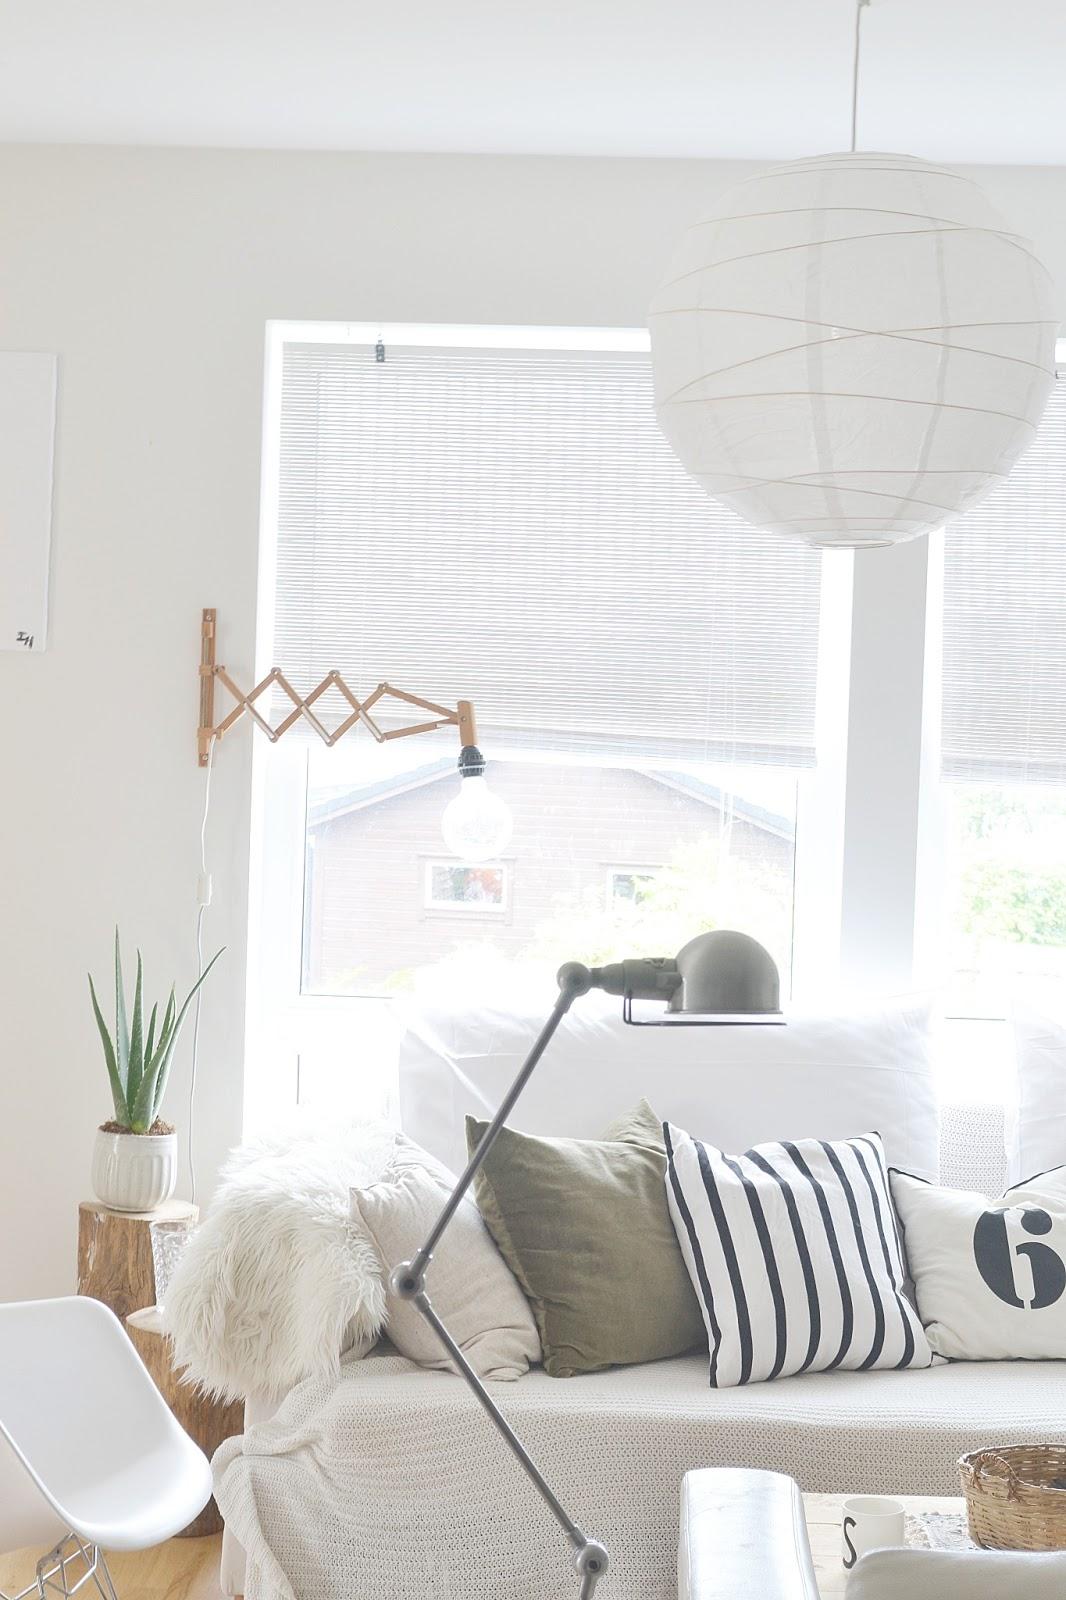 En stue – stadig forandring – silje husebø